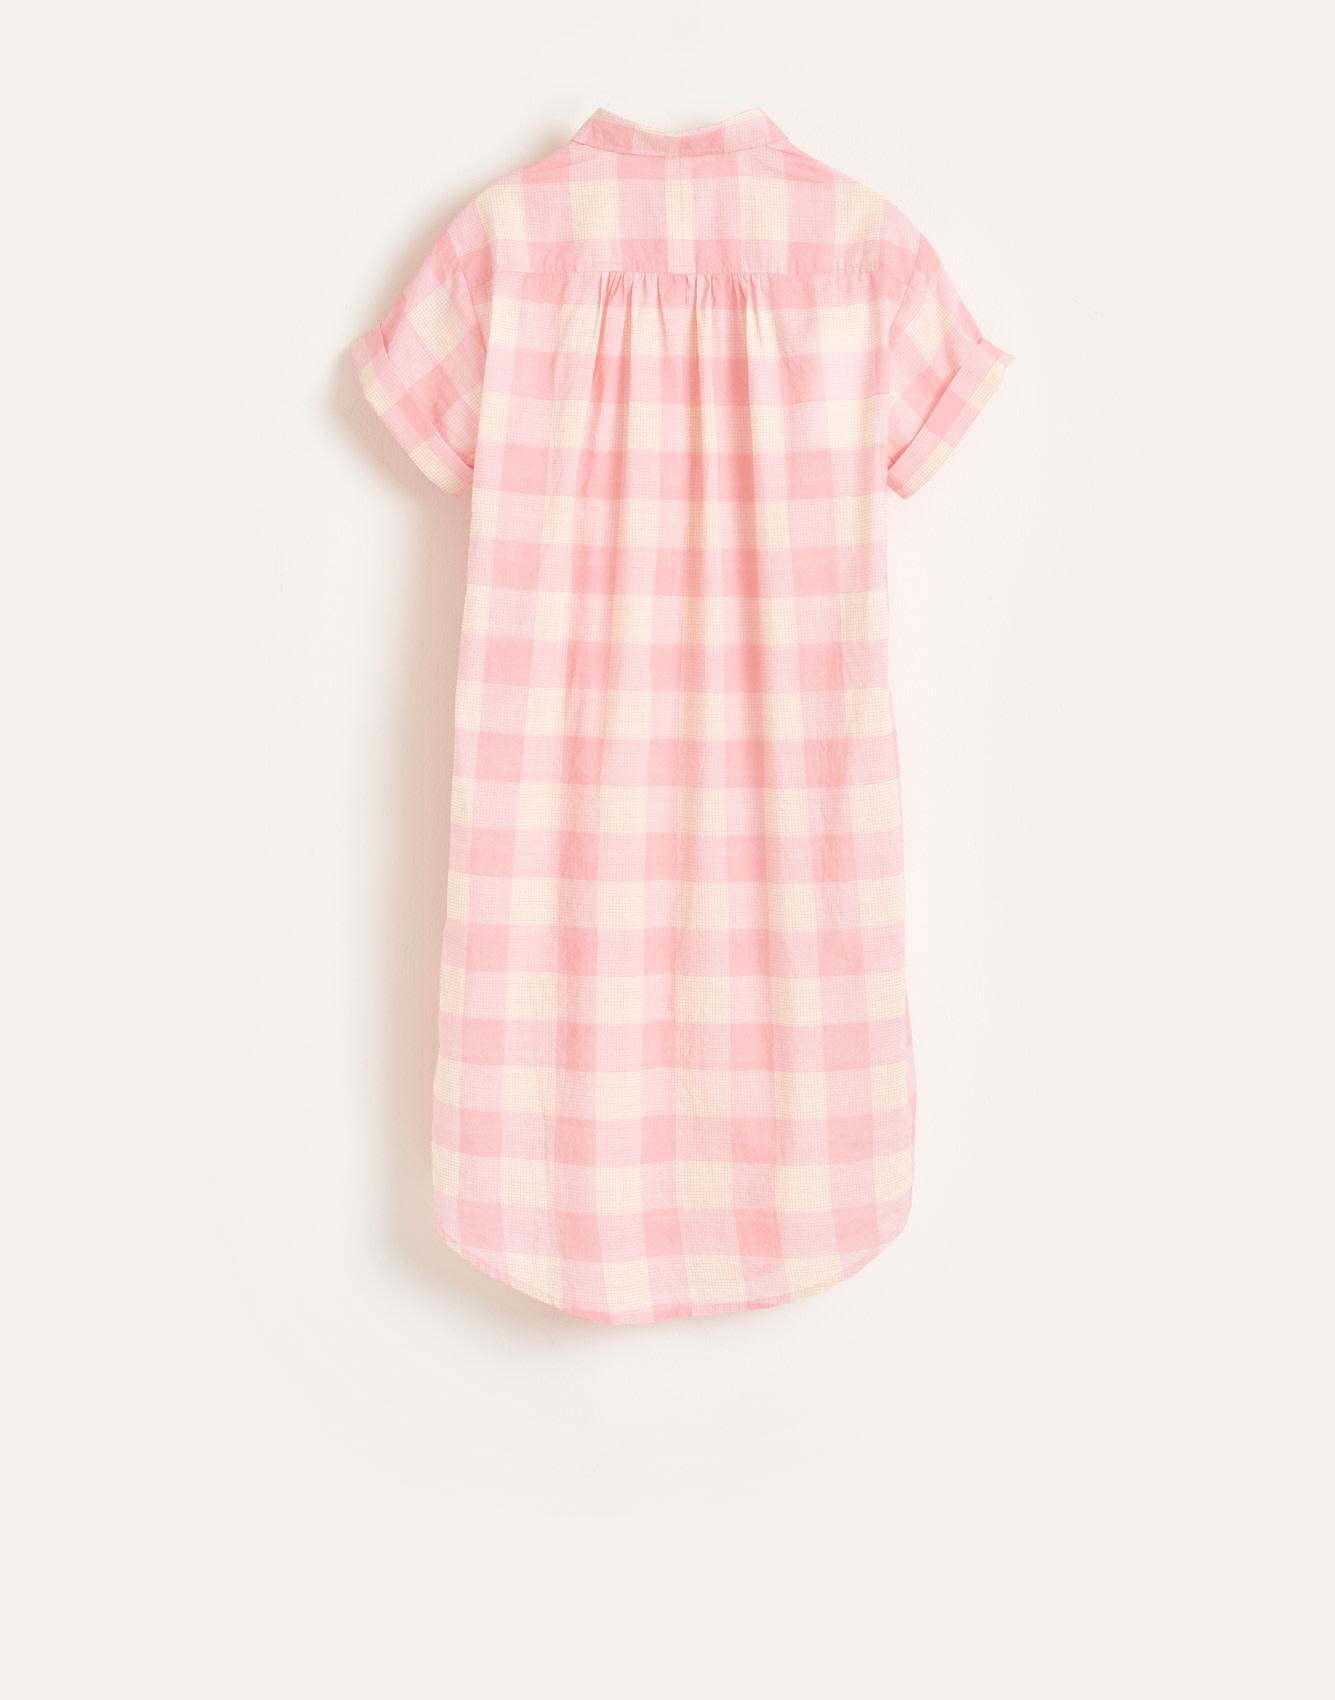 Angie dress check-5